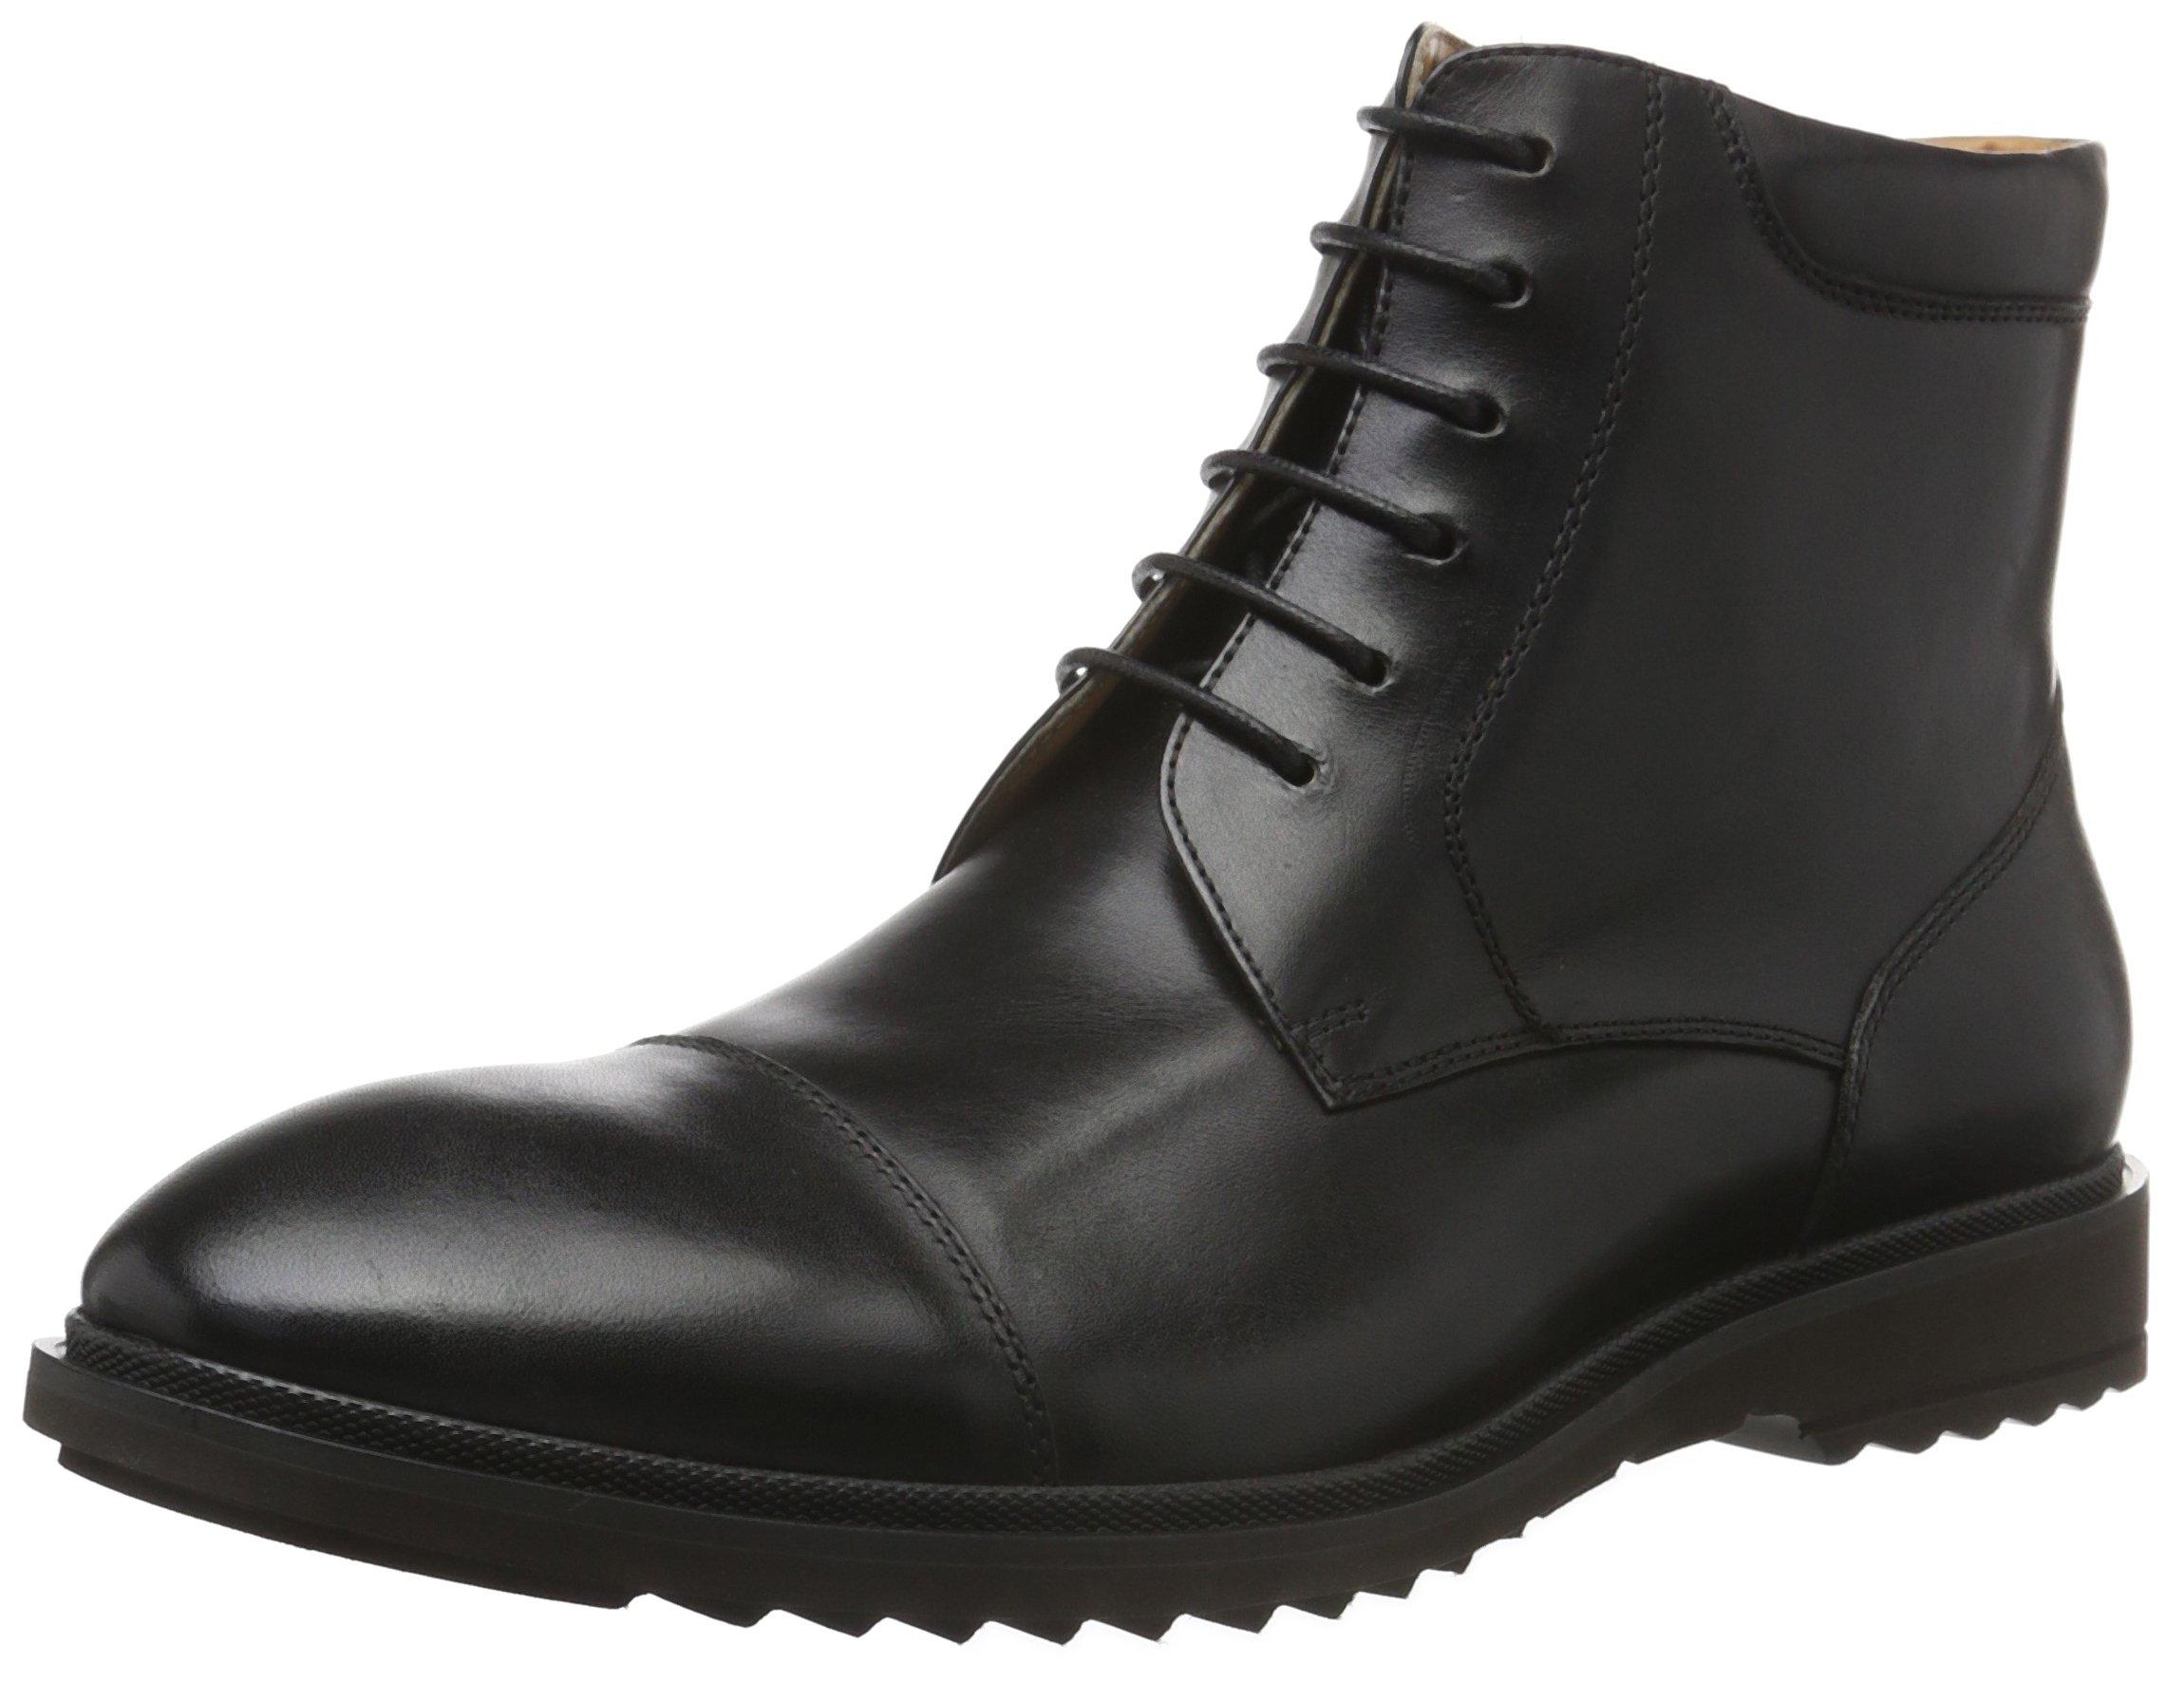 Brax Bosco Stiefel 1Rangers Boots HommeNoirnero41 Eu 8nNm0w